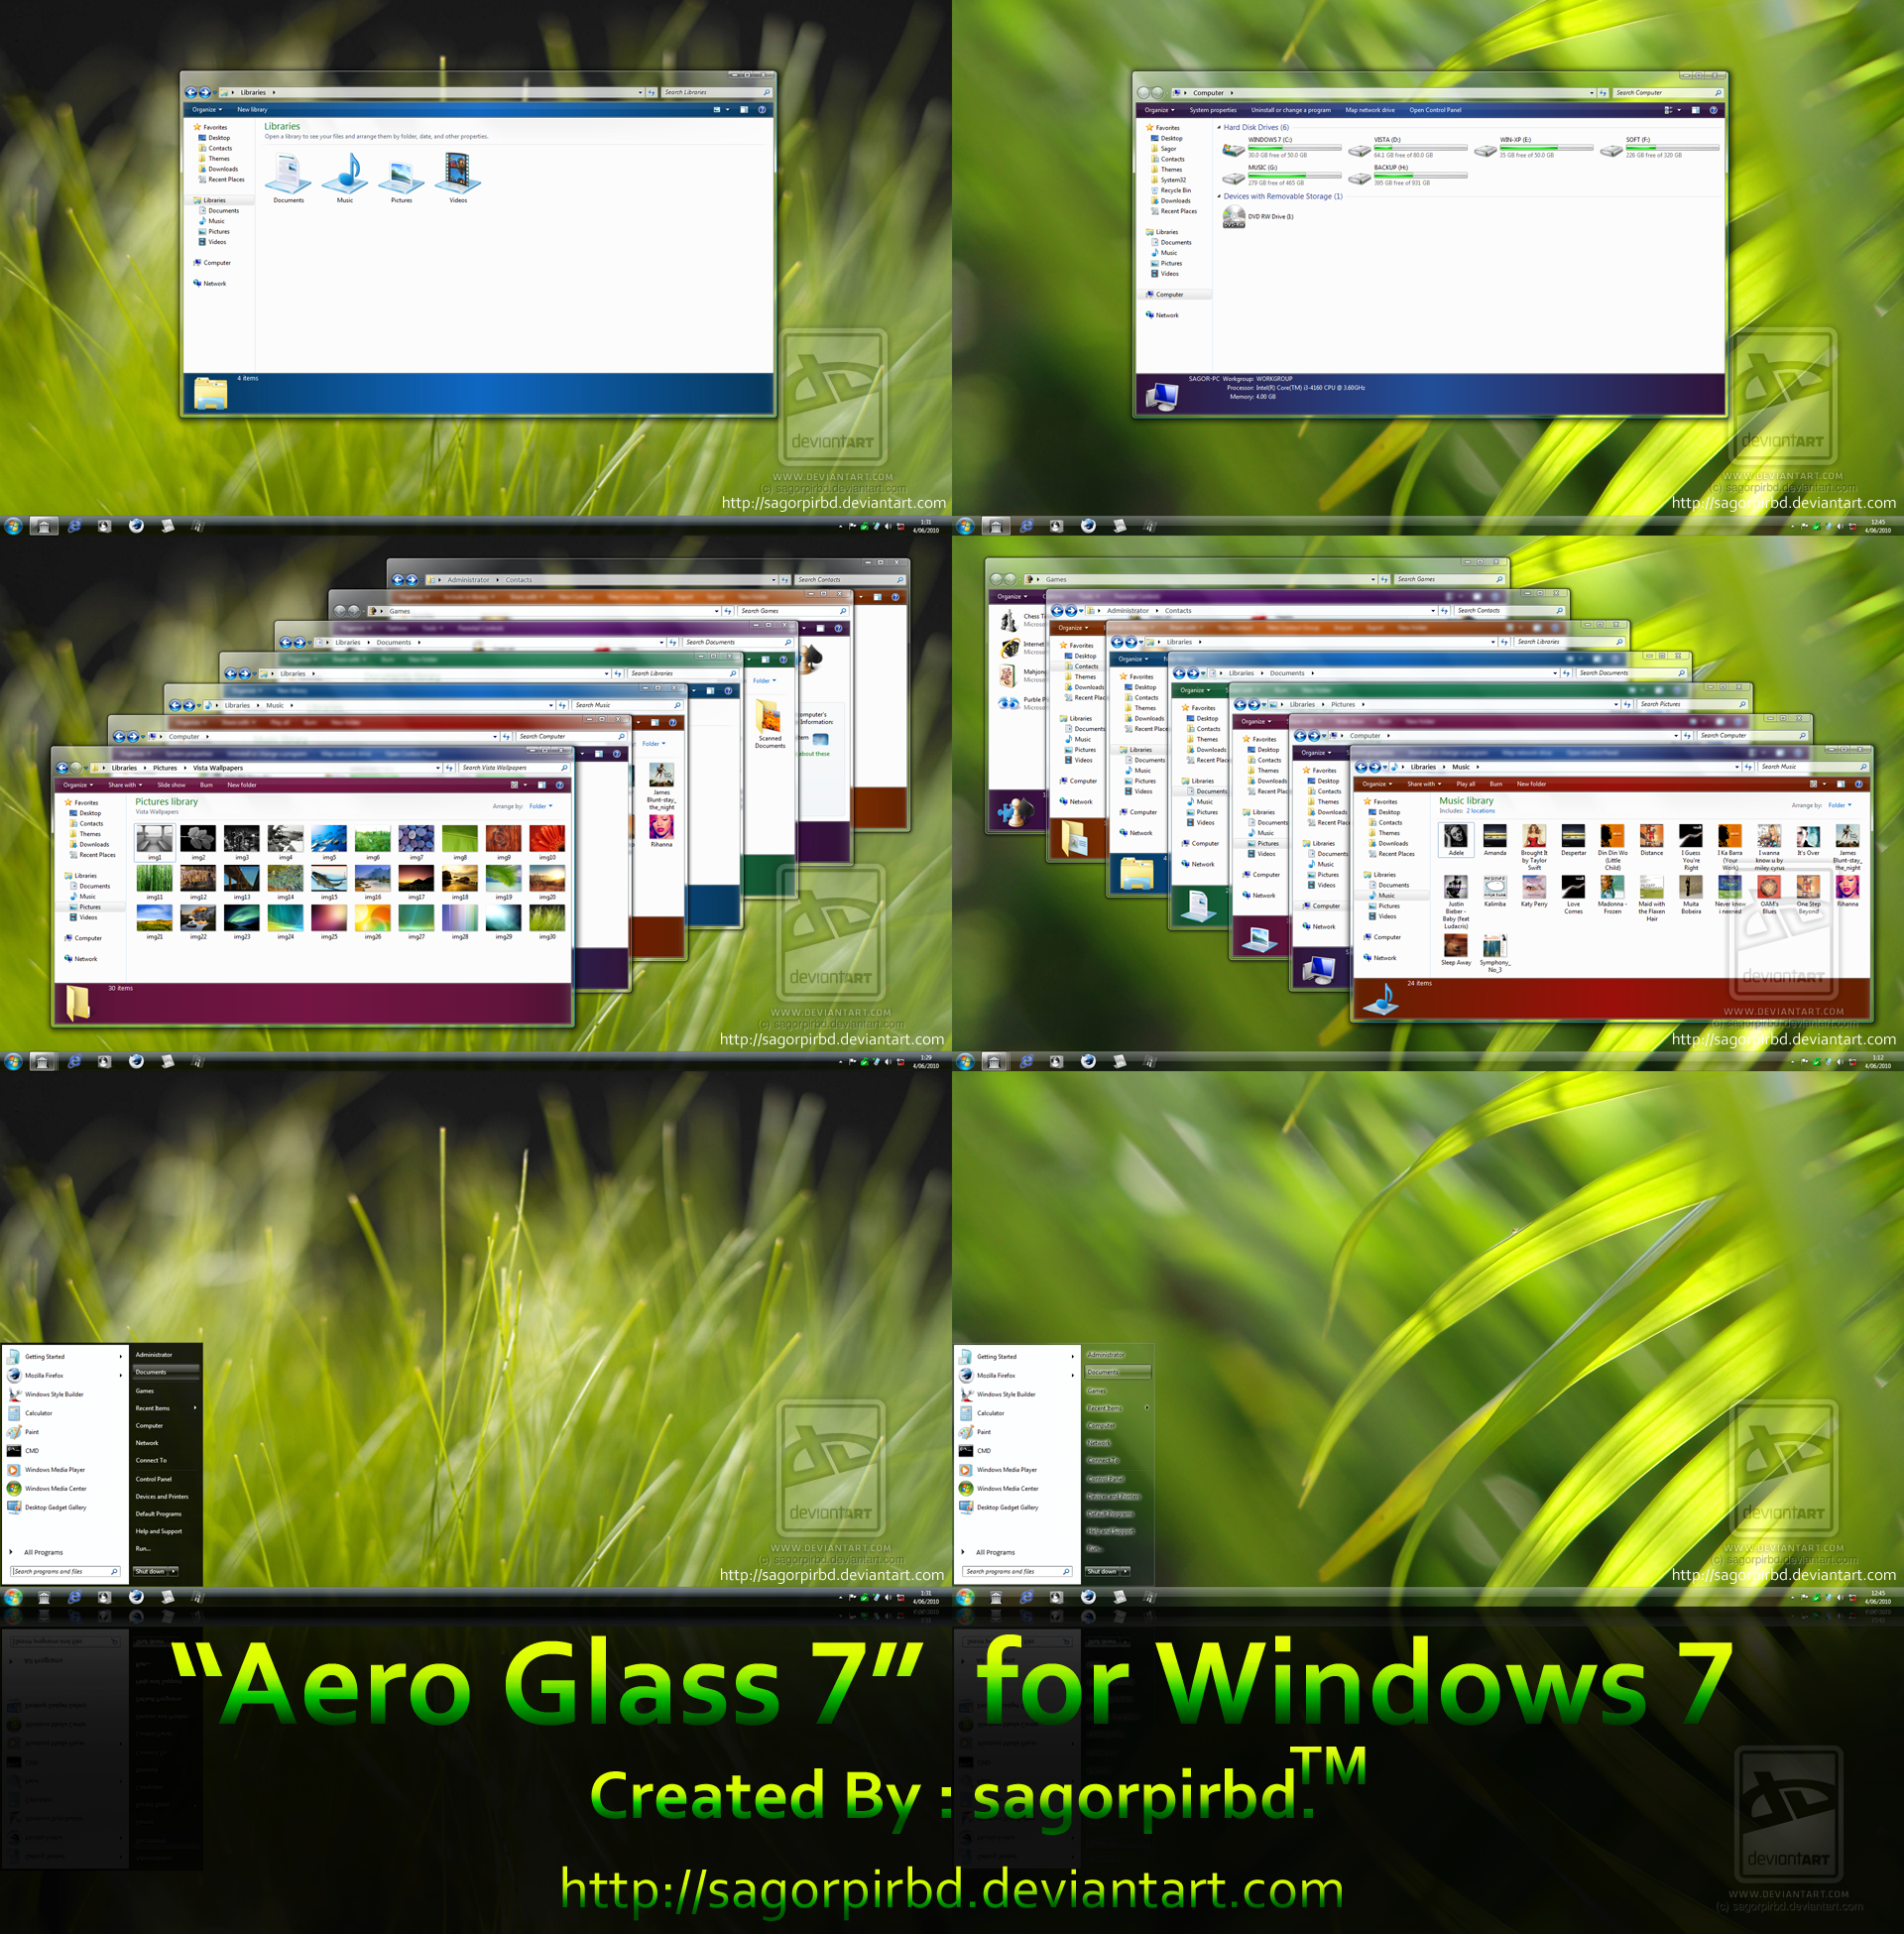 Aero Glass 7 for Windows 7 by sagorpirbd